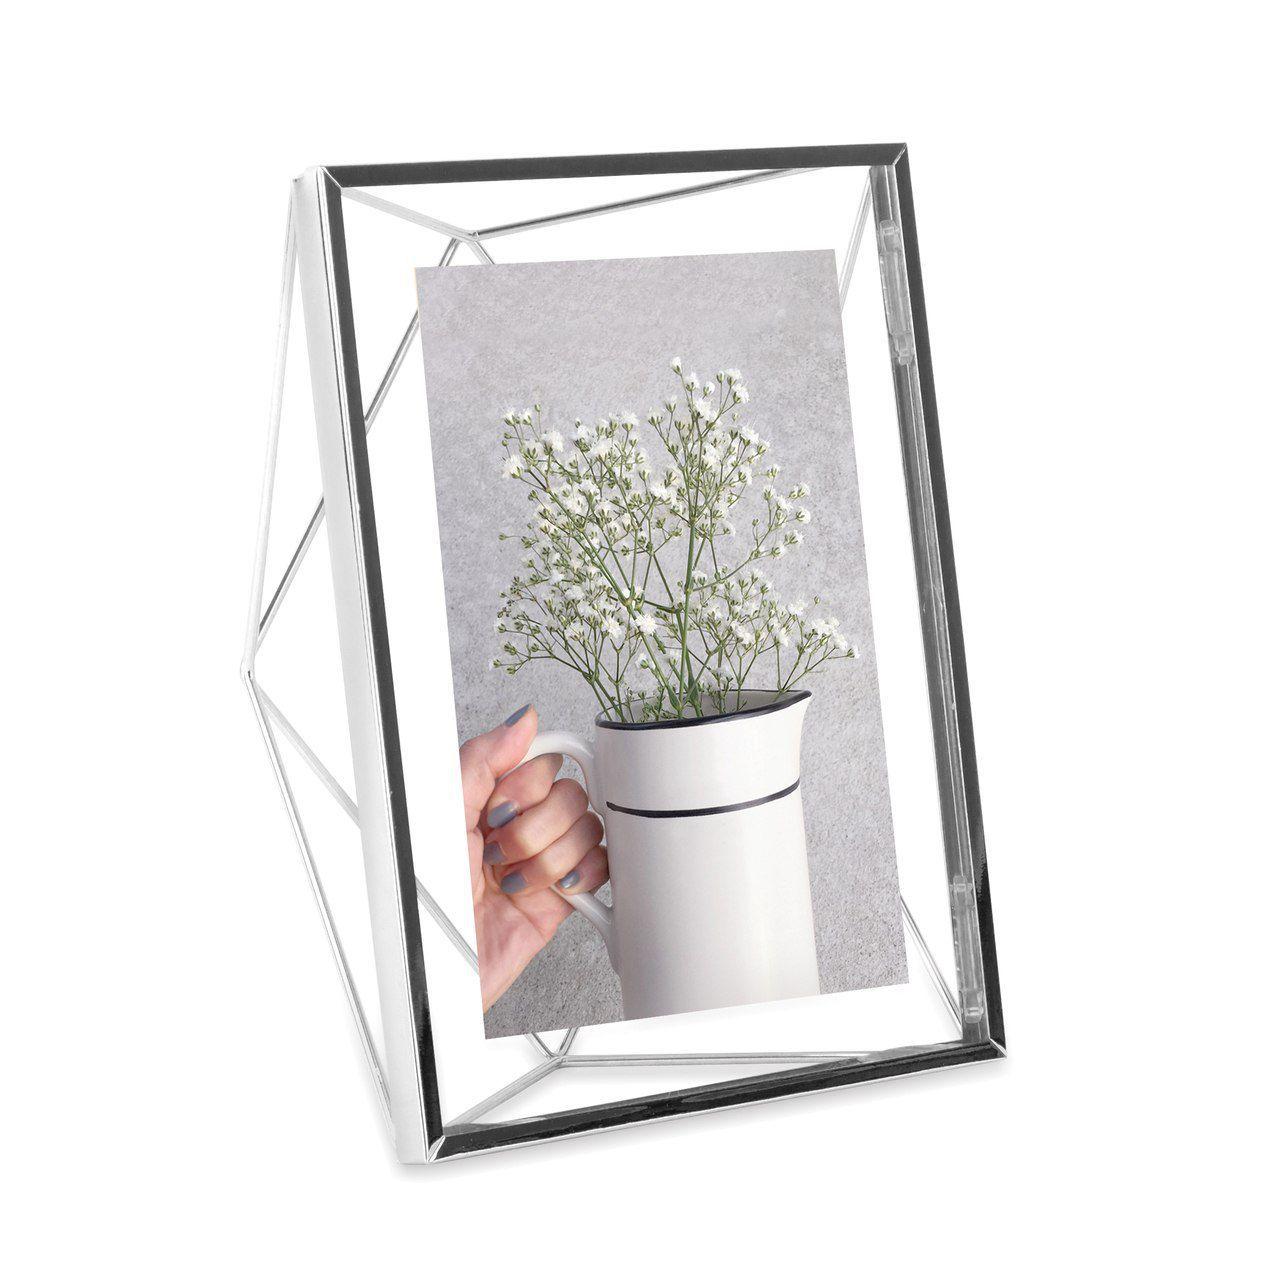 Porta-retrato Prisma Prata 10x15cm - Umbra